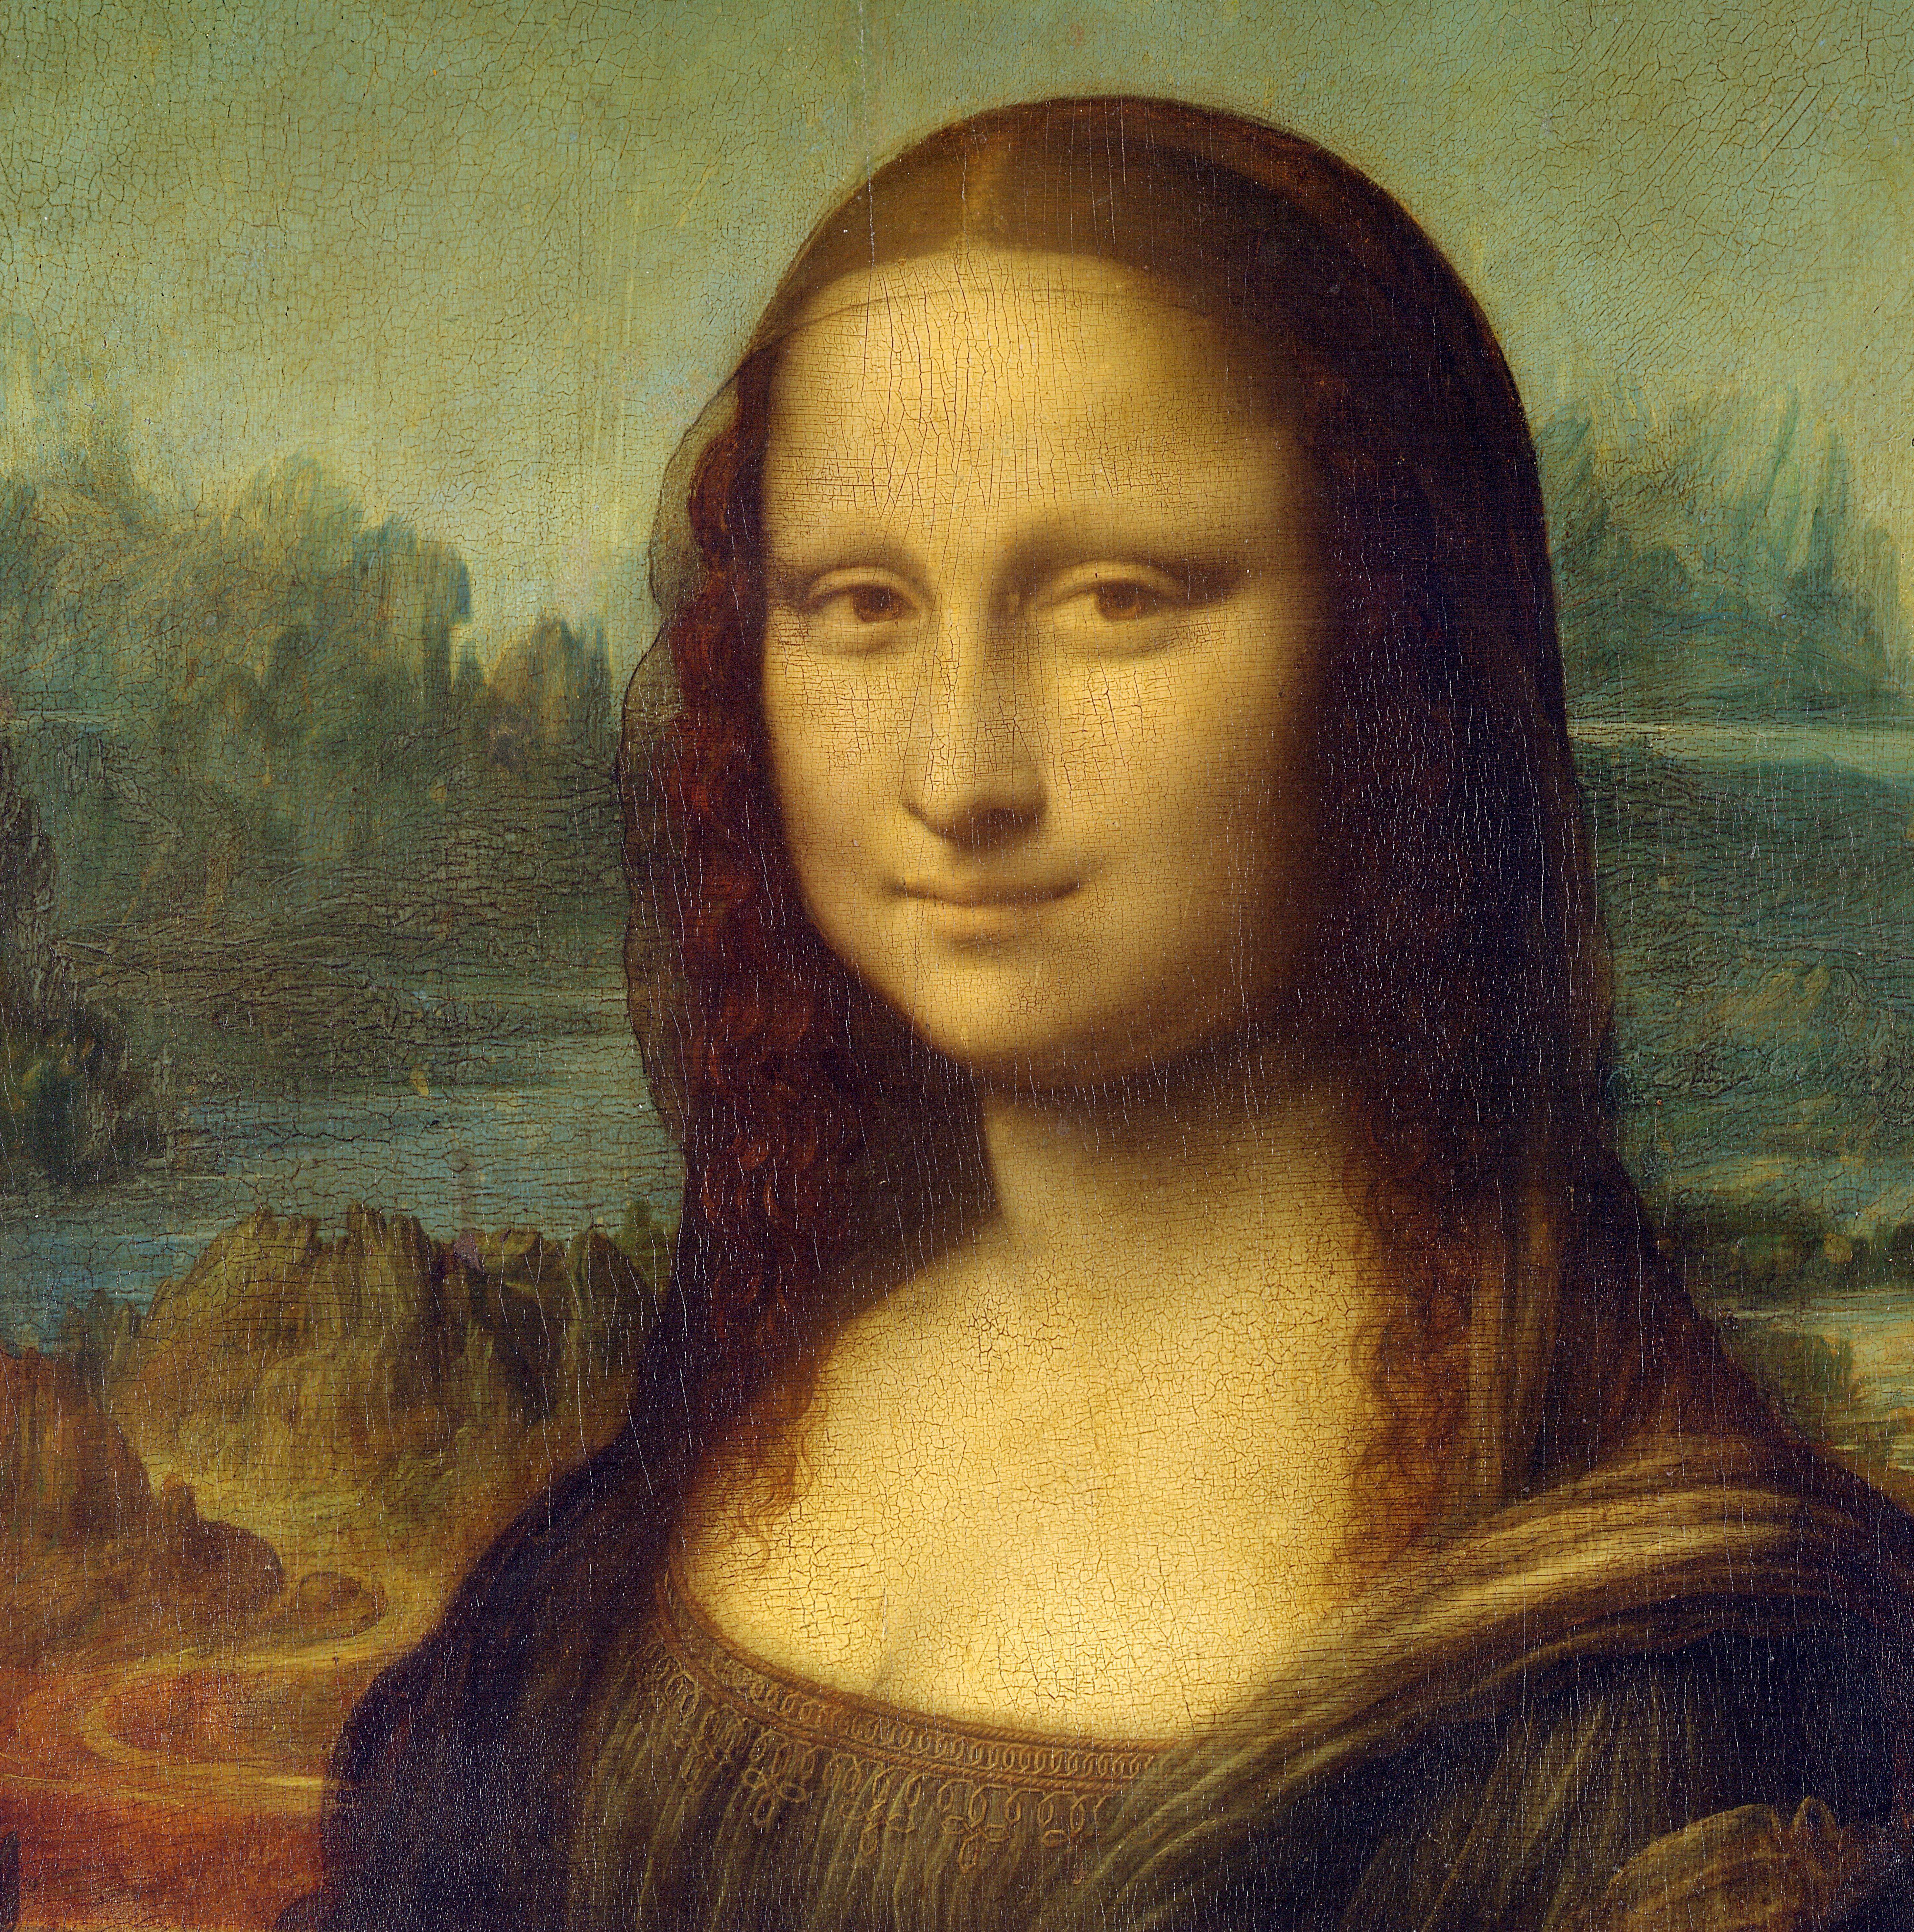 Image: Mona Lisa